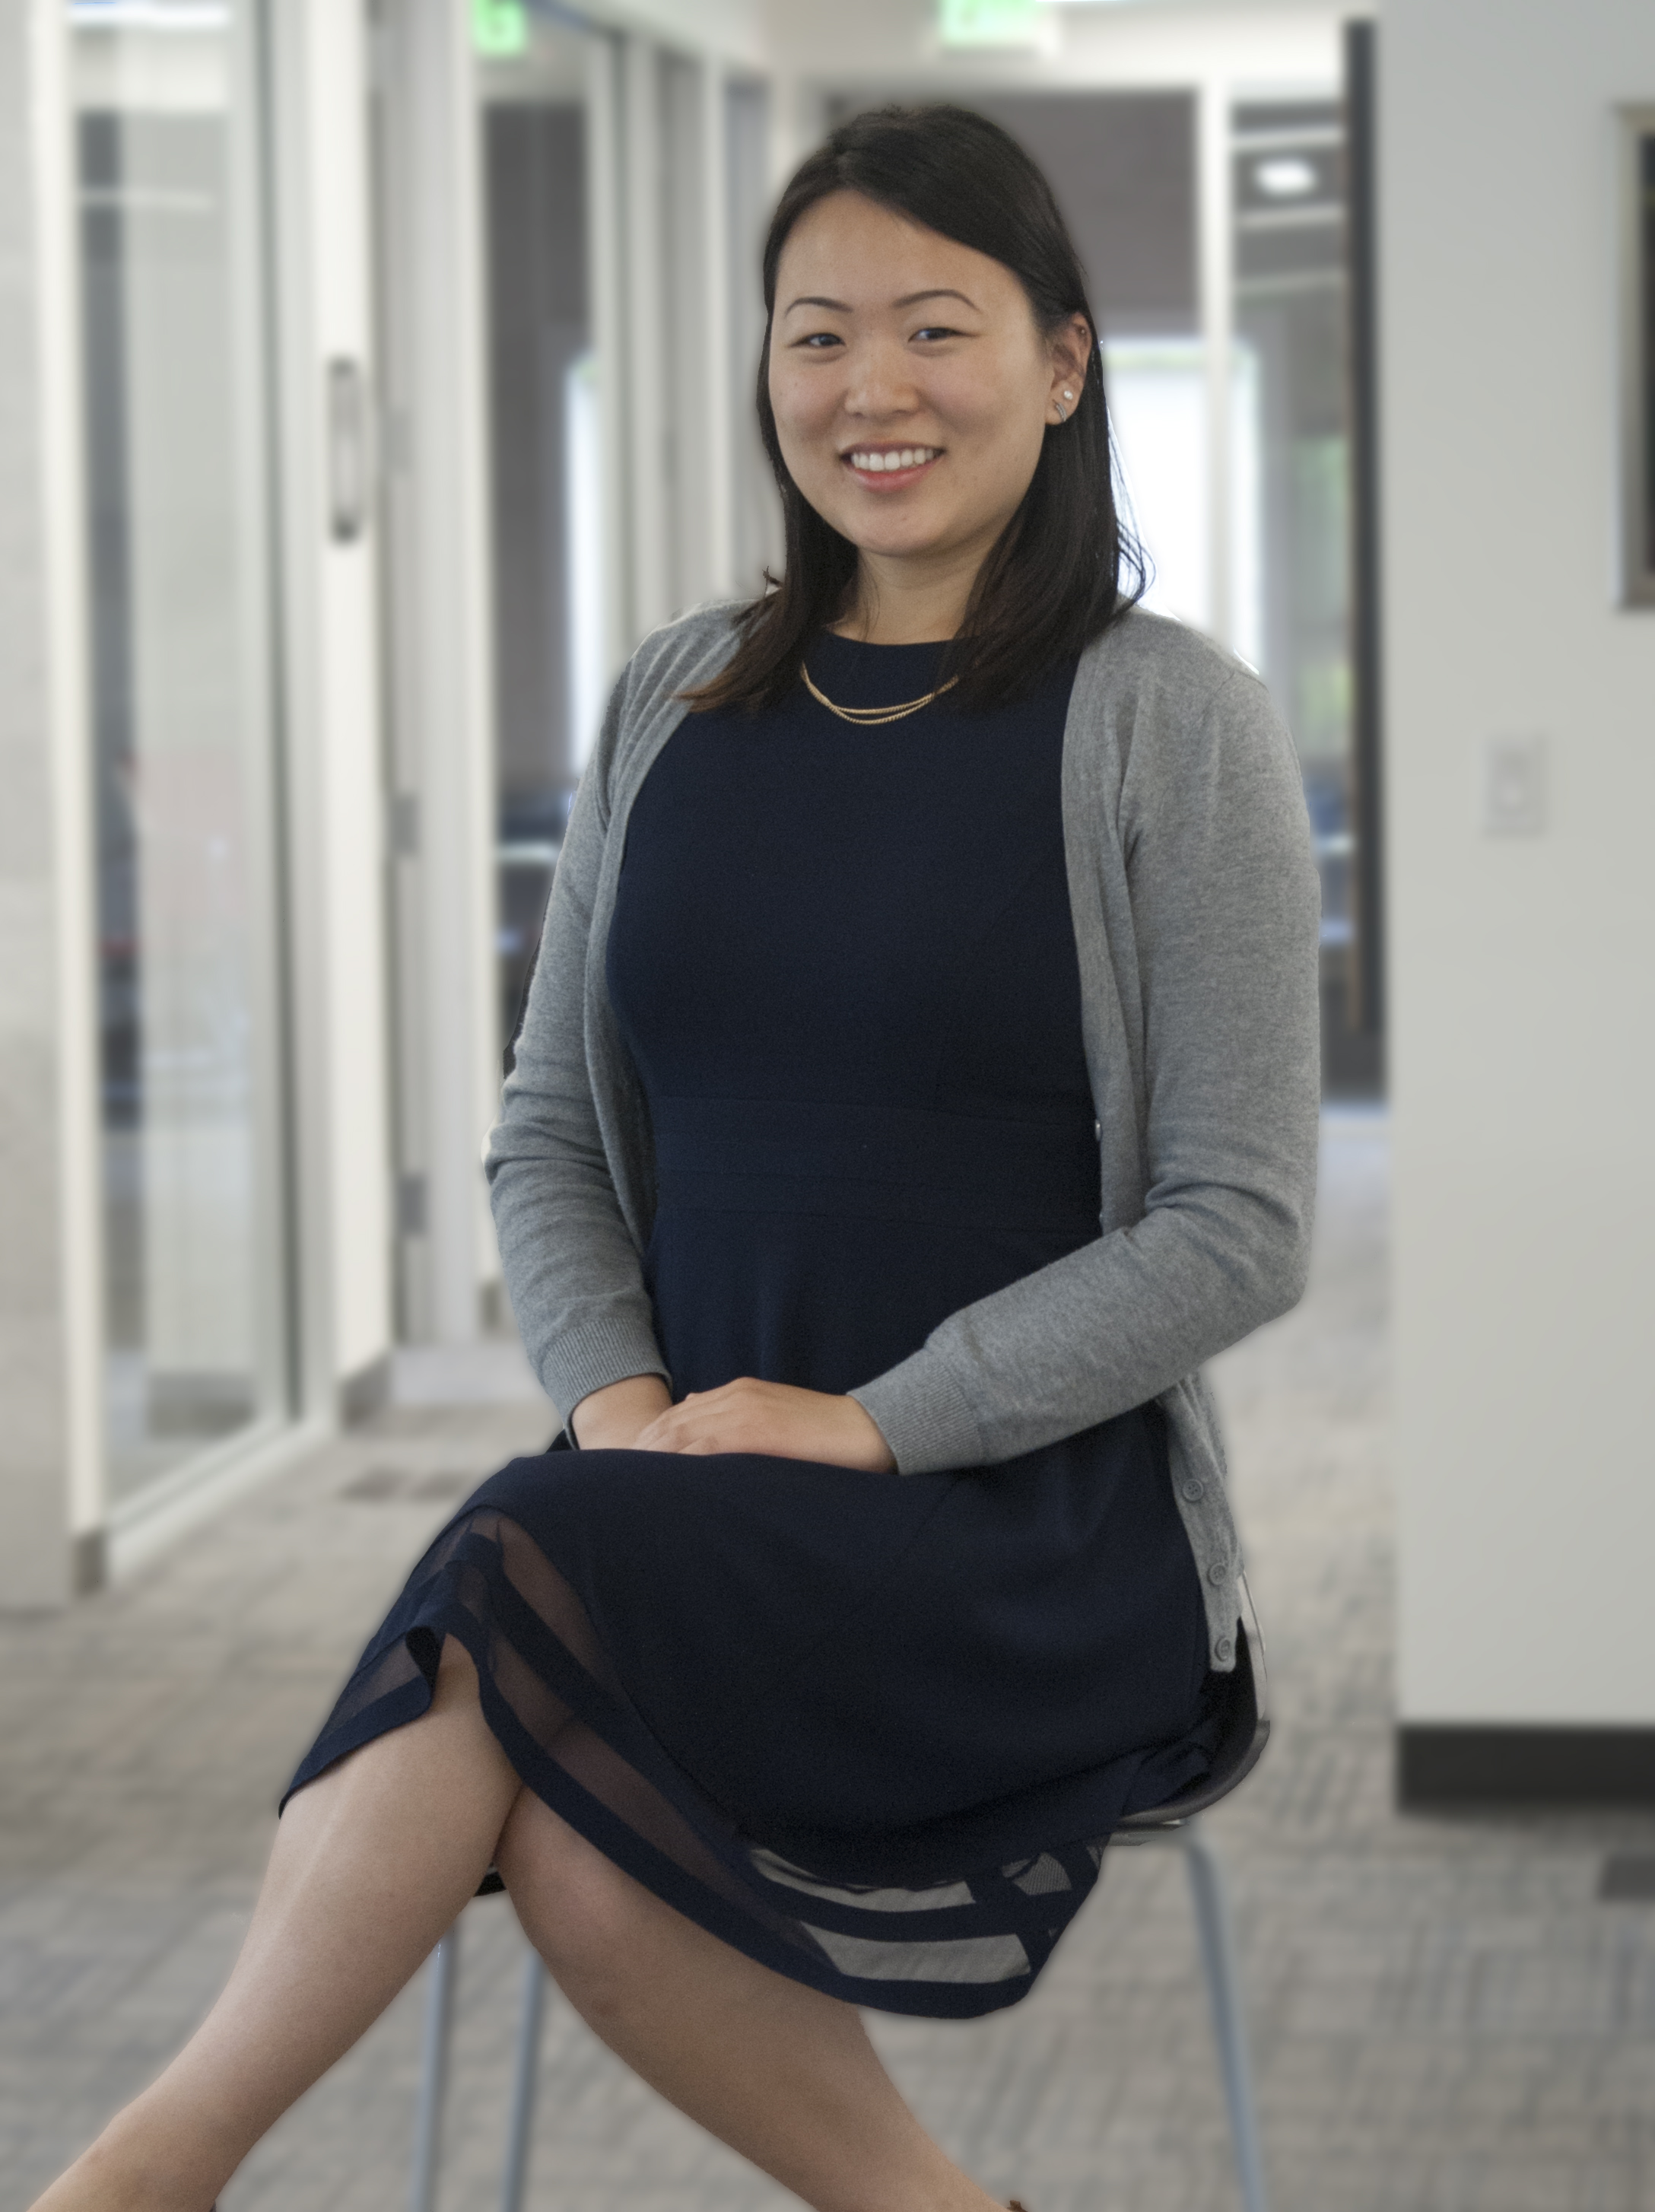 dk Engineering staff member Lillian Xie headshot